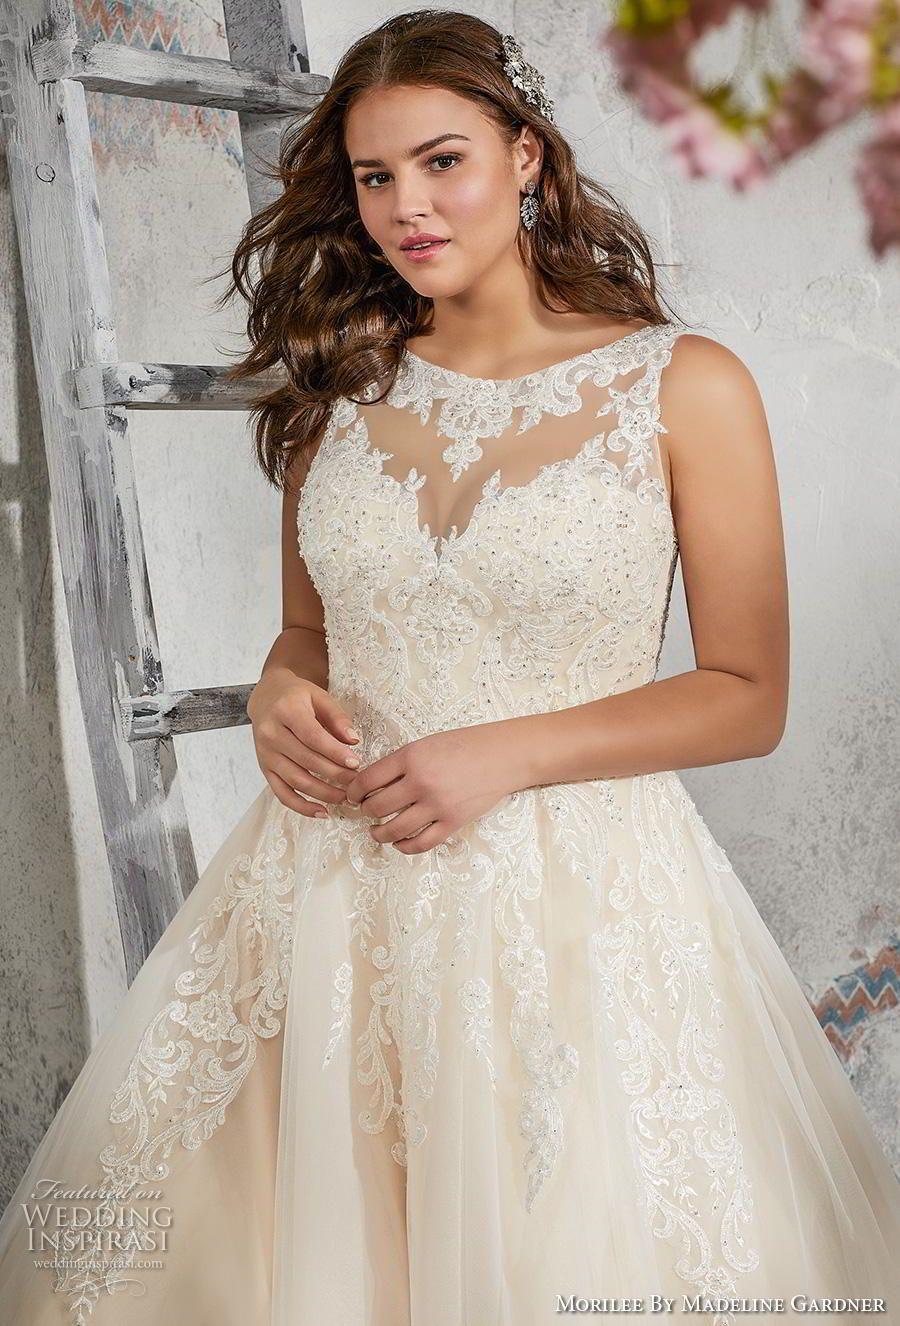 Morileeus Julietta Bridal Collection u Designed to Celebrate Your